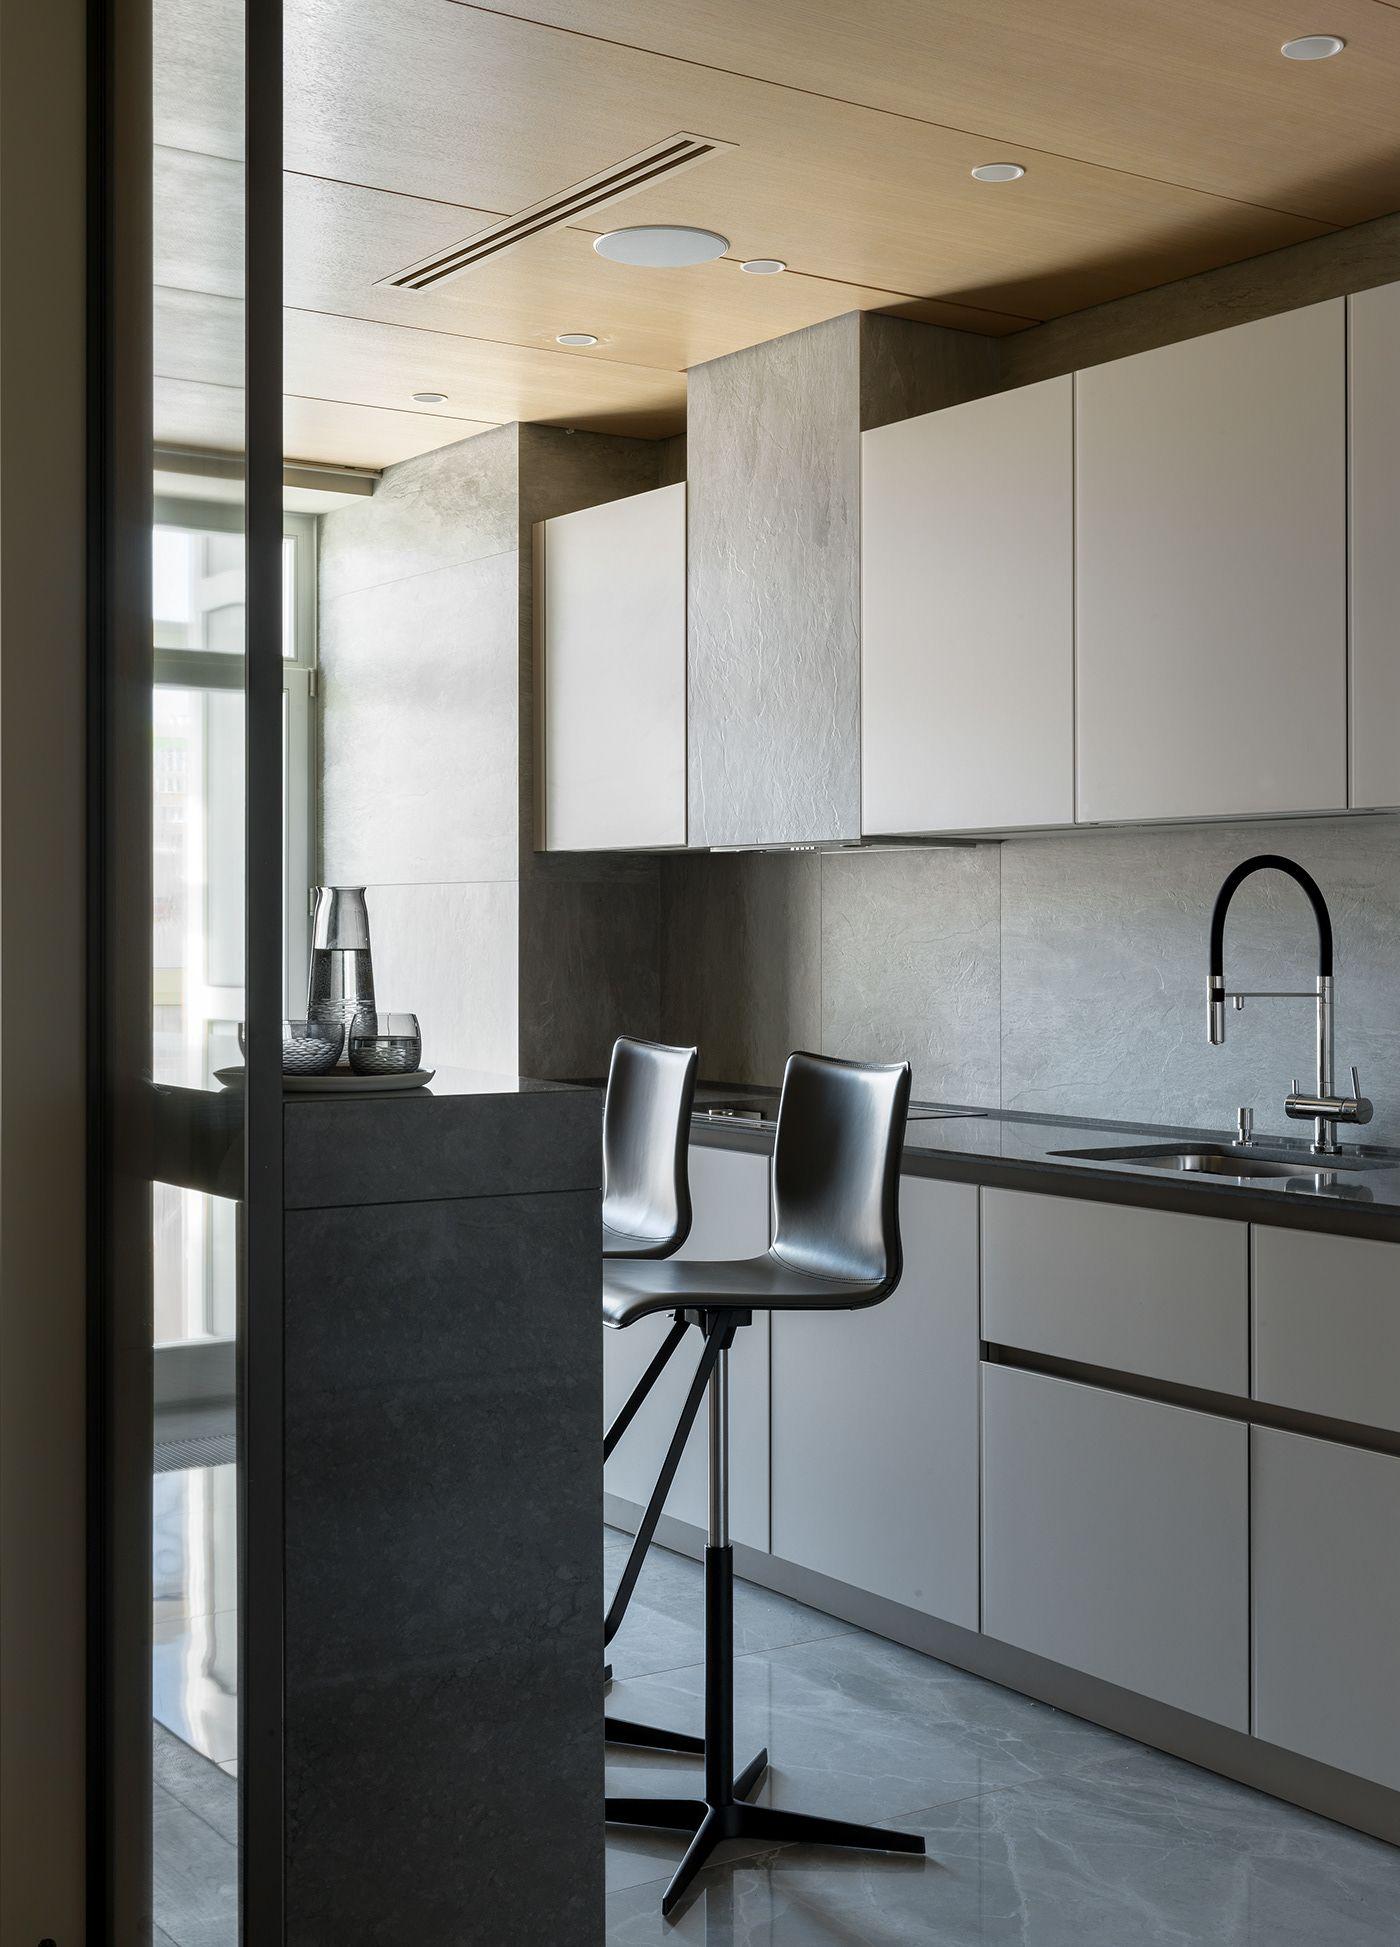 Nordic apartments on Behance Интерьер, Идеи интерьера